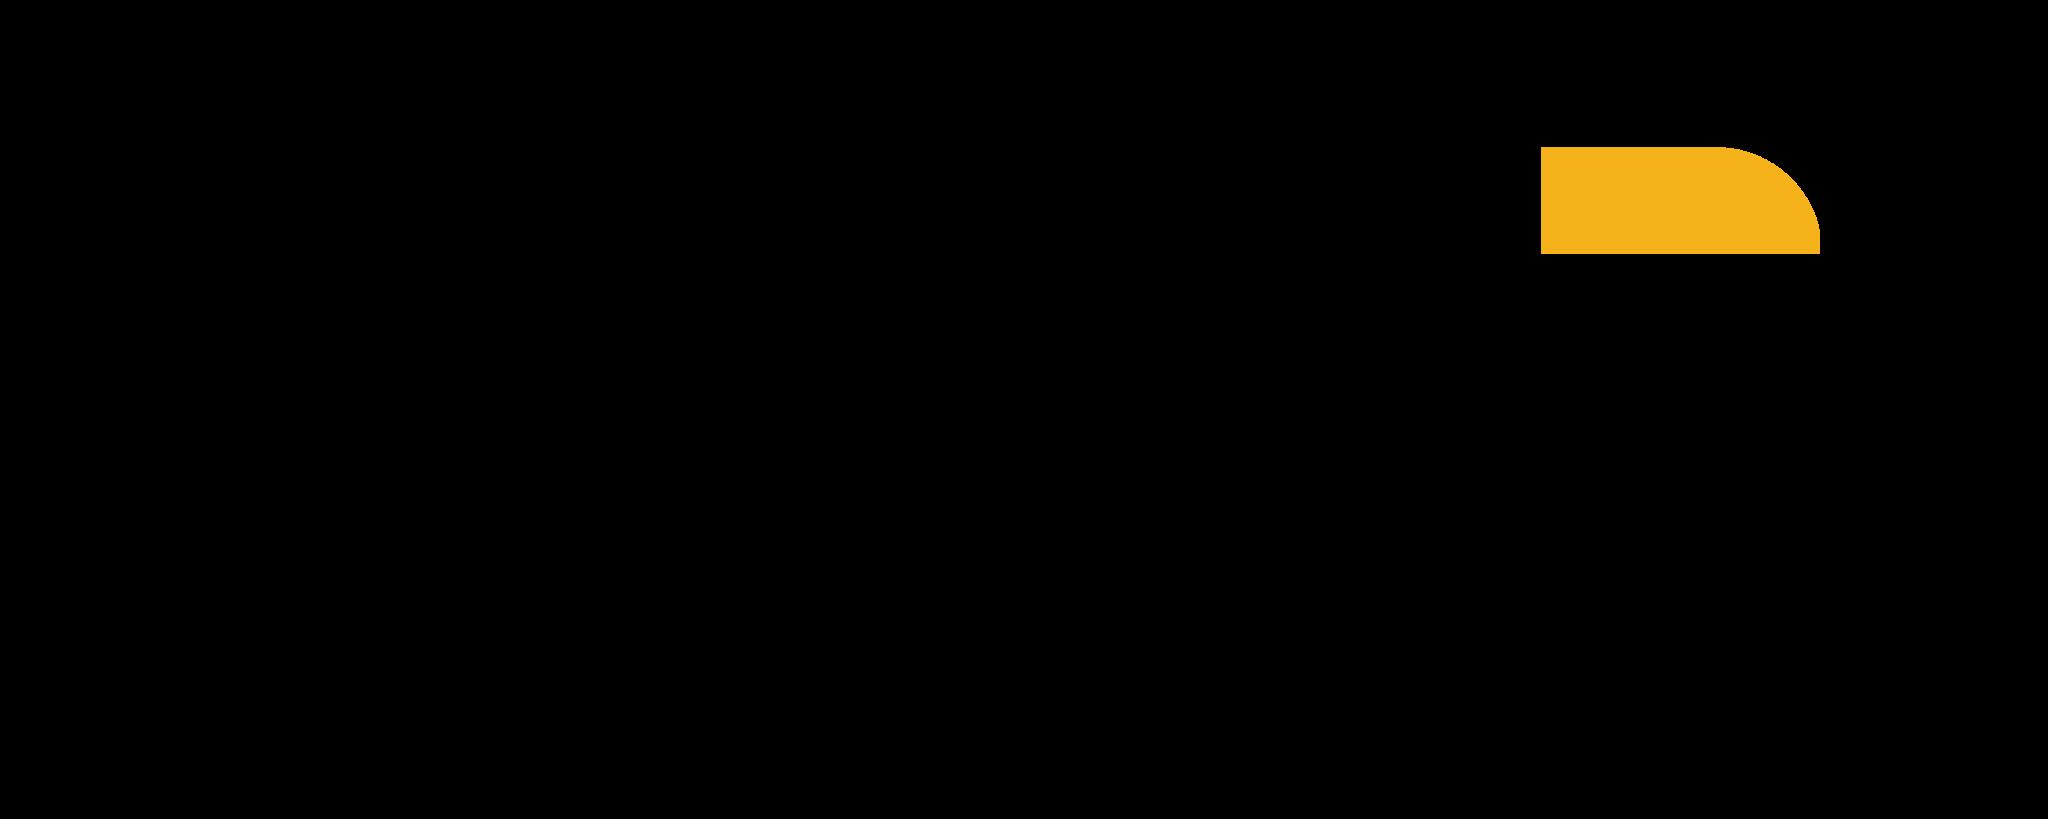 Enduro Metals Corp. (OTC:SIOCF)